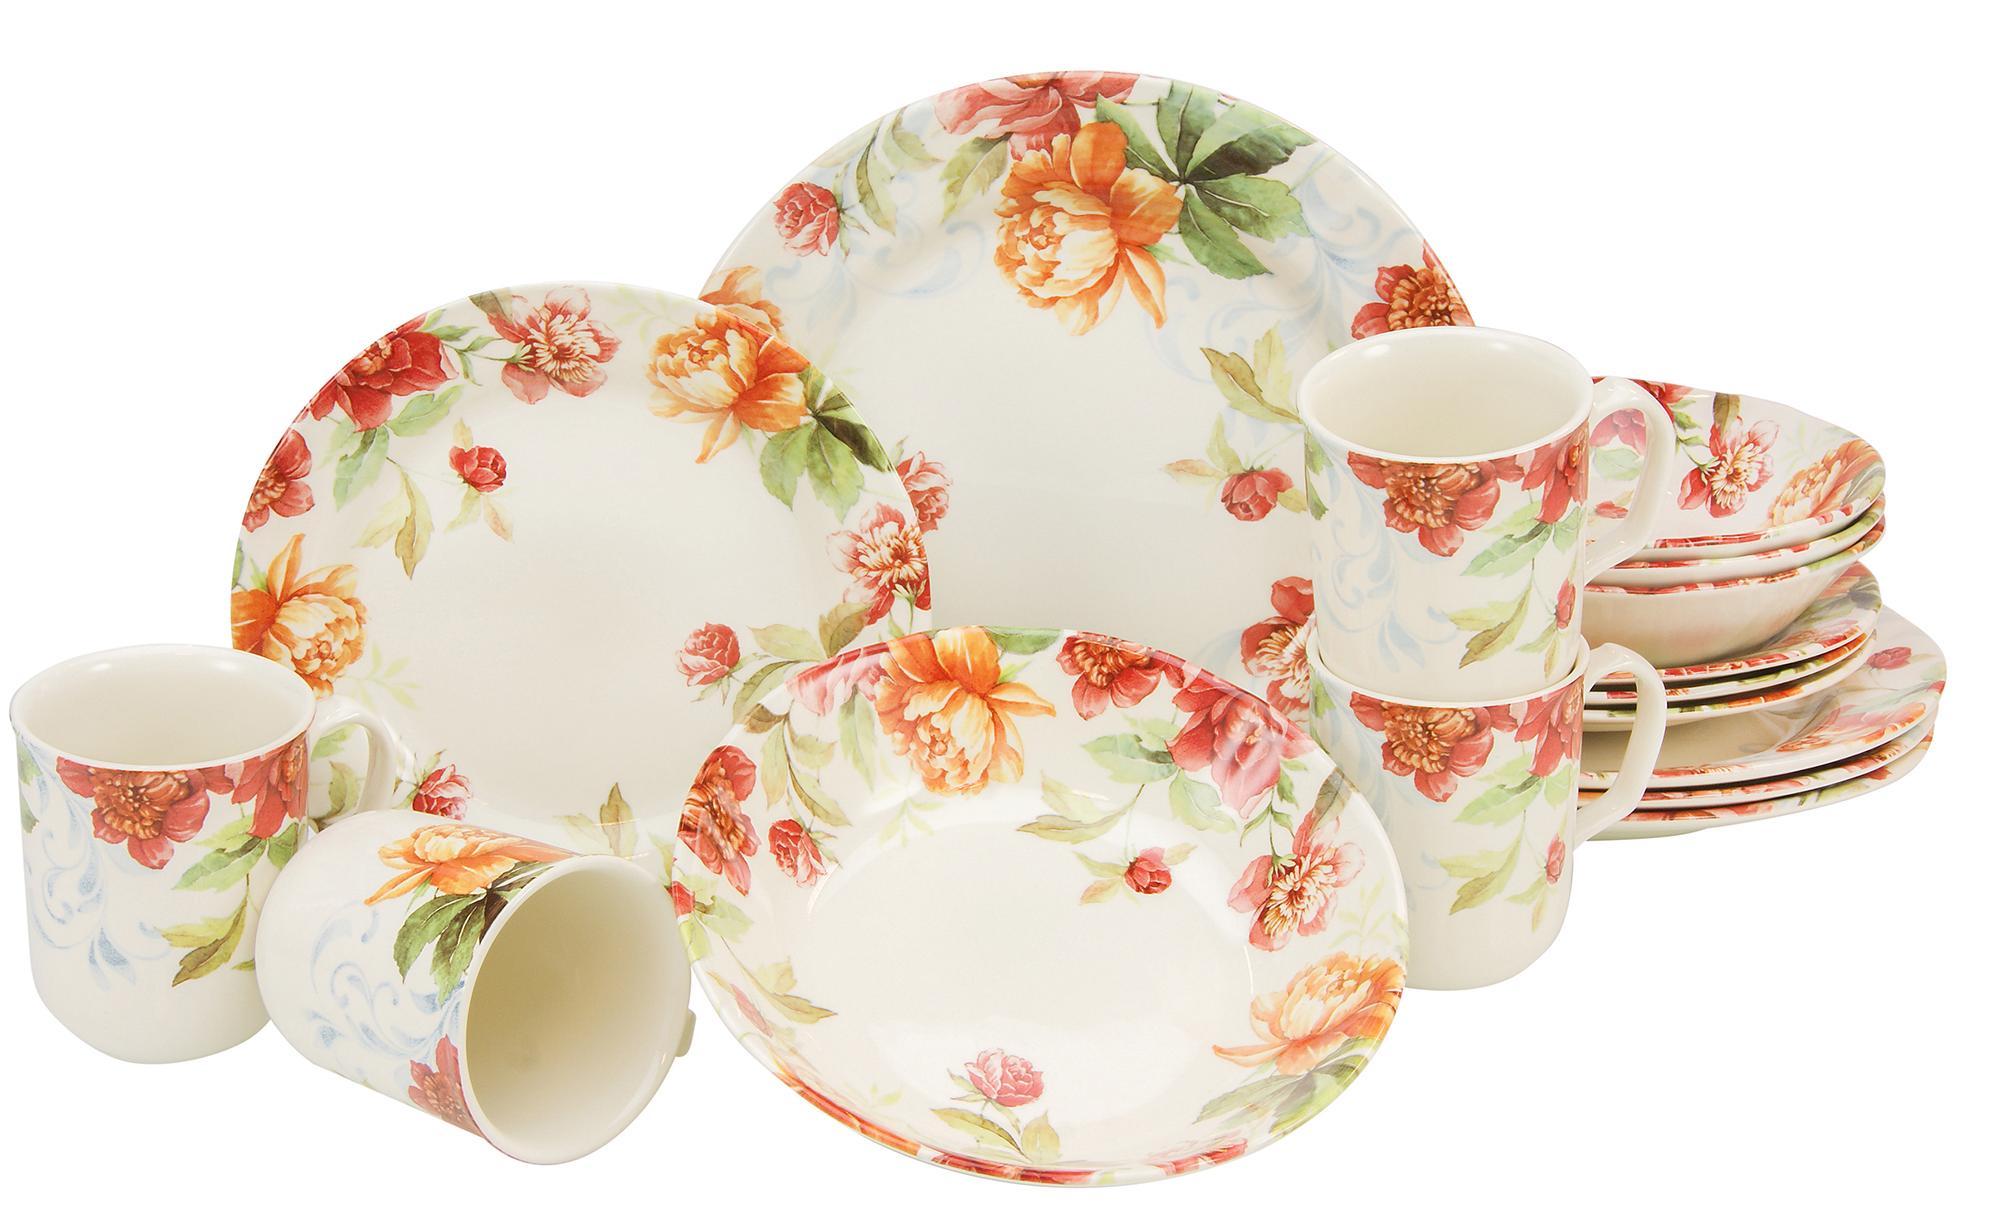 CreaTable Kombiservice Modern Floral, (Set, 16 tlg.), oppulentes Rosendekor bunt Geschirr-Sets Geschirr, Porzellan Tischaccessoires Haushaltswaren